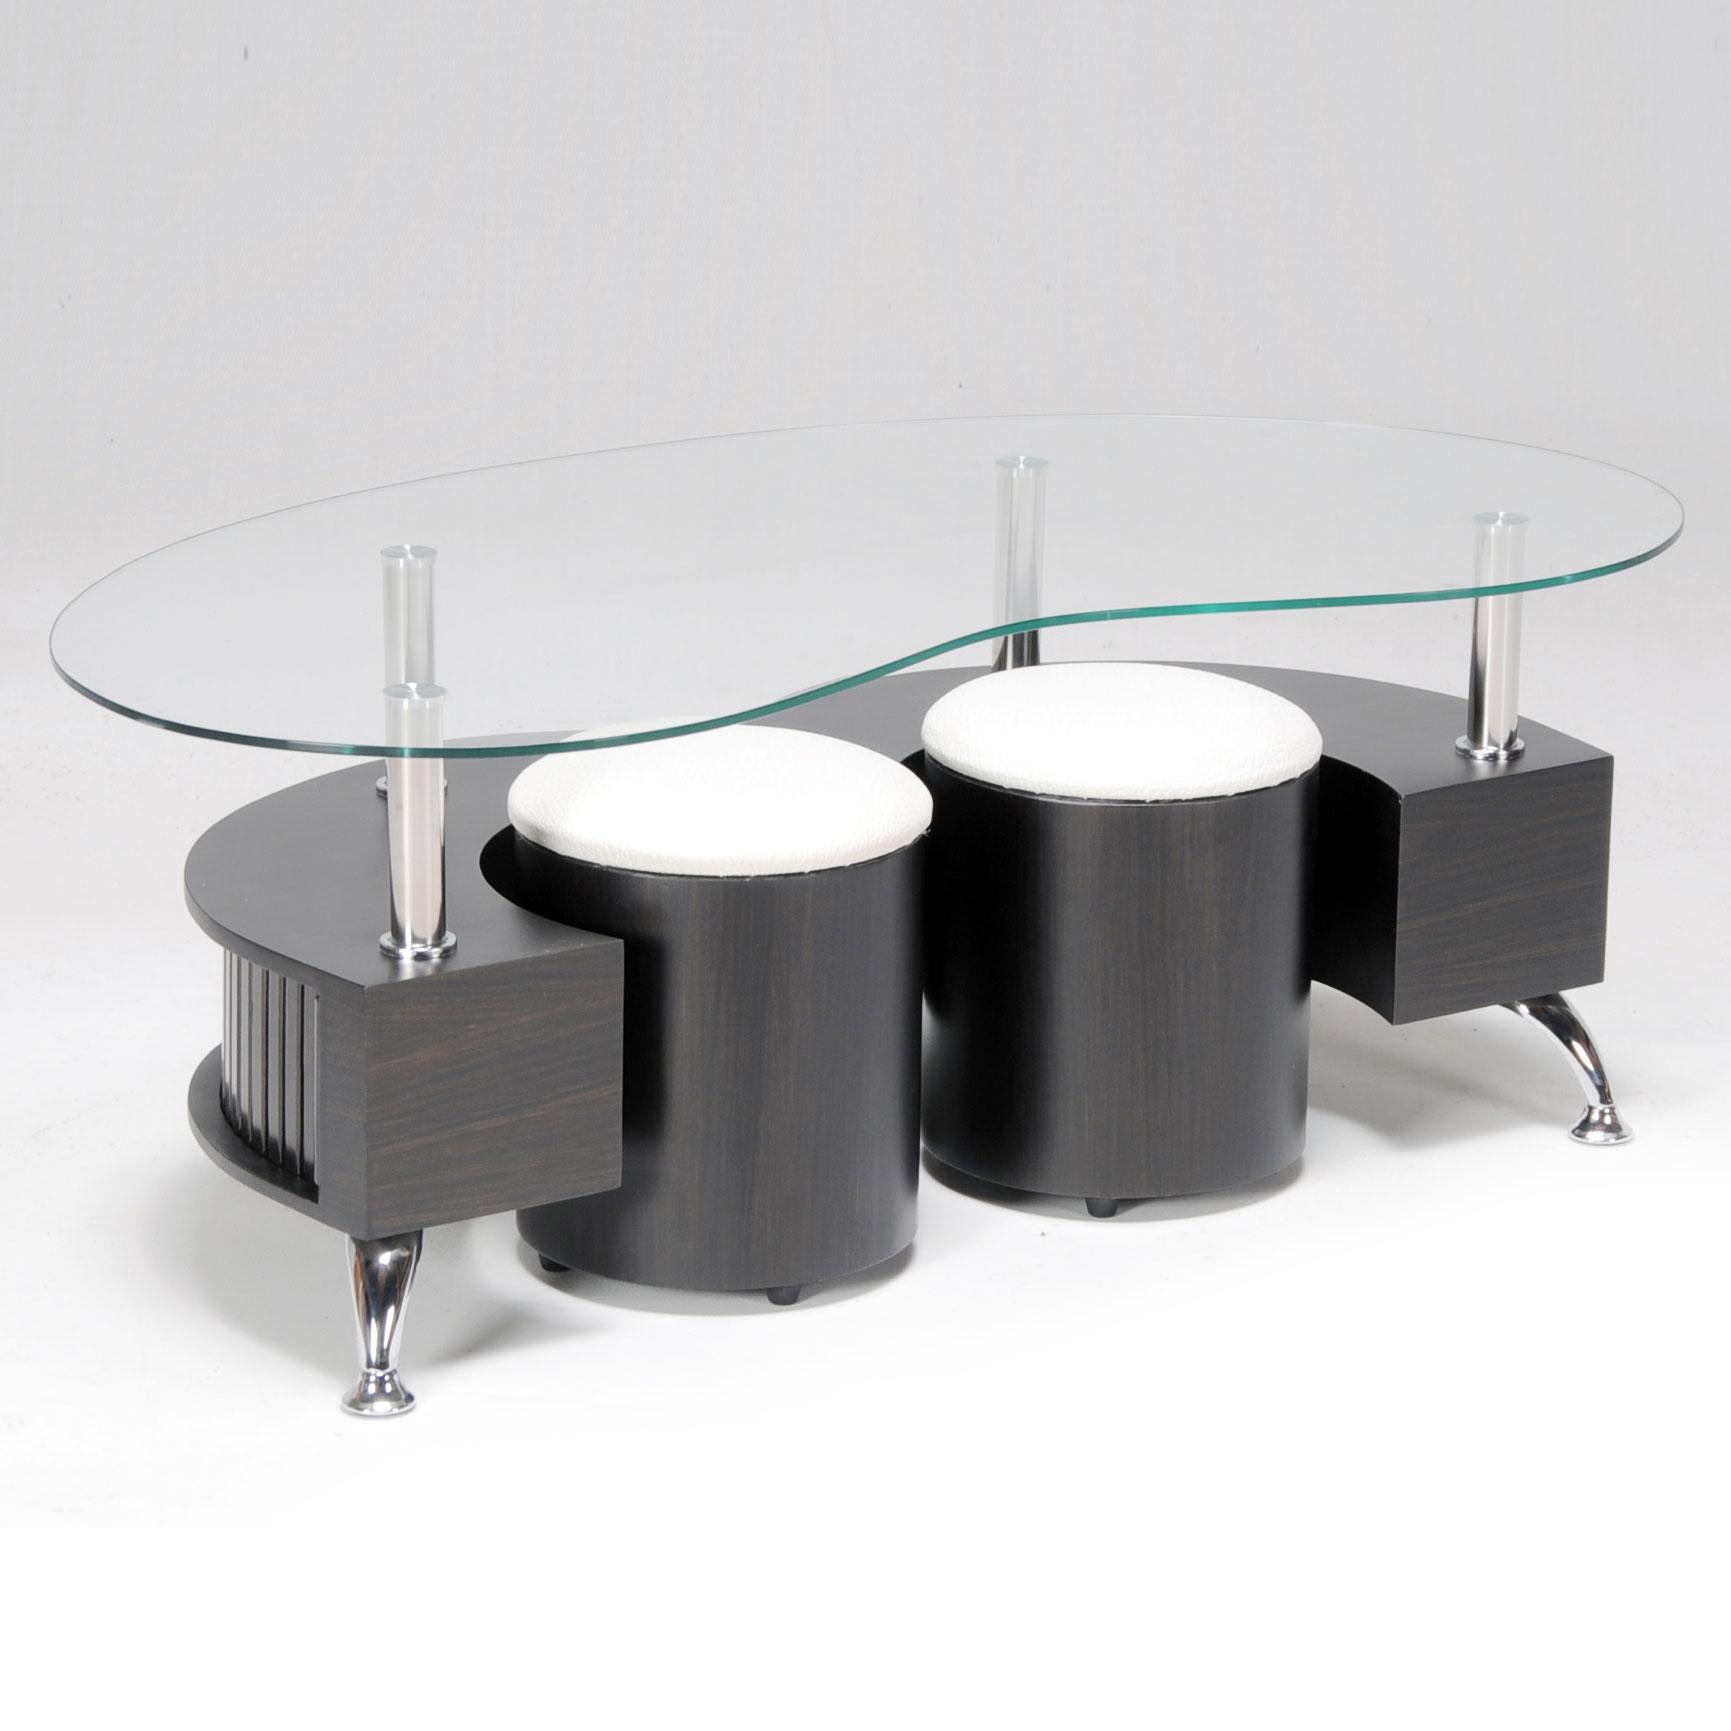 Table basse en verre avec pied en bois